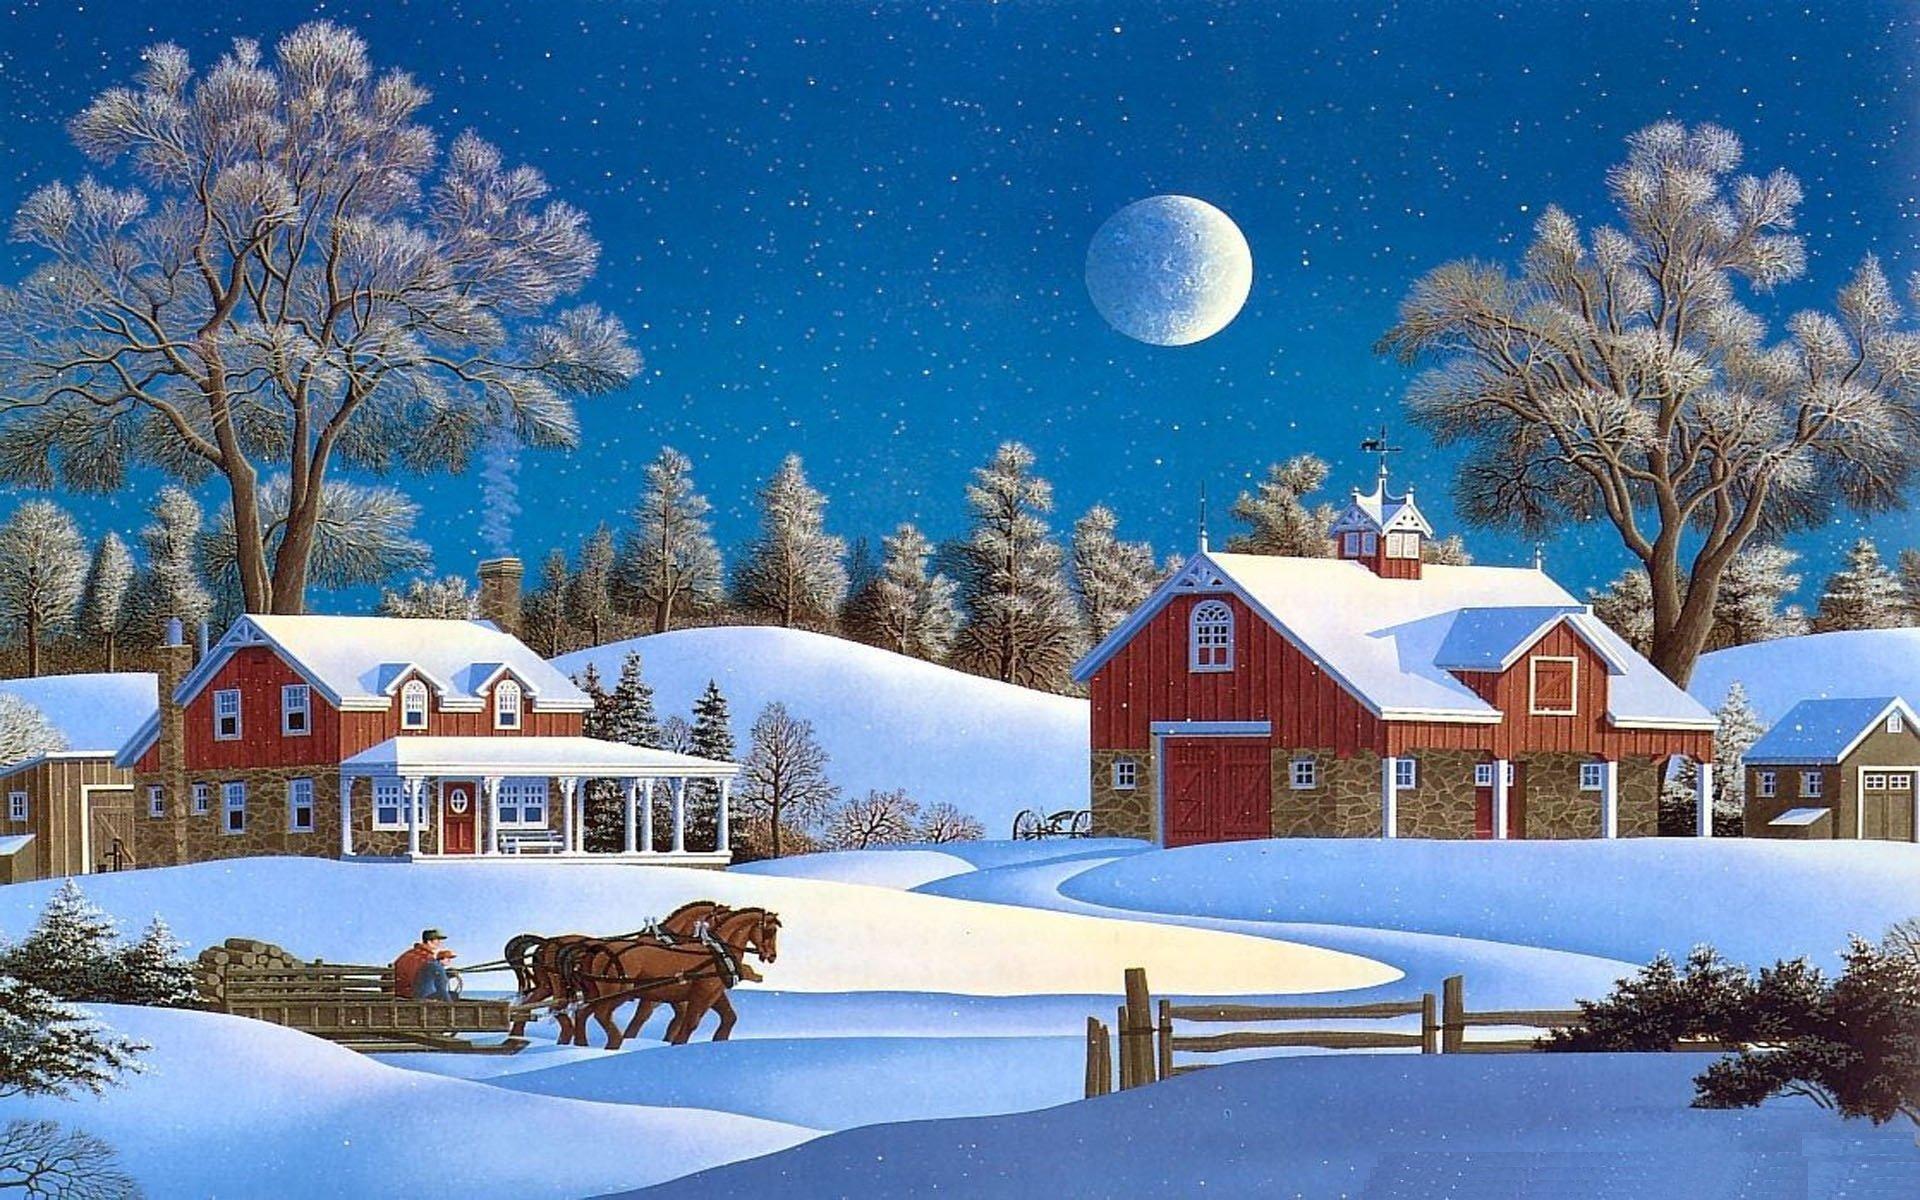 Winter snow nature landscape art artwork wallpaper 1920x1200 865944 wallpaperup - Winter farm scenes wallpaper ...